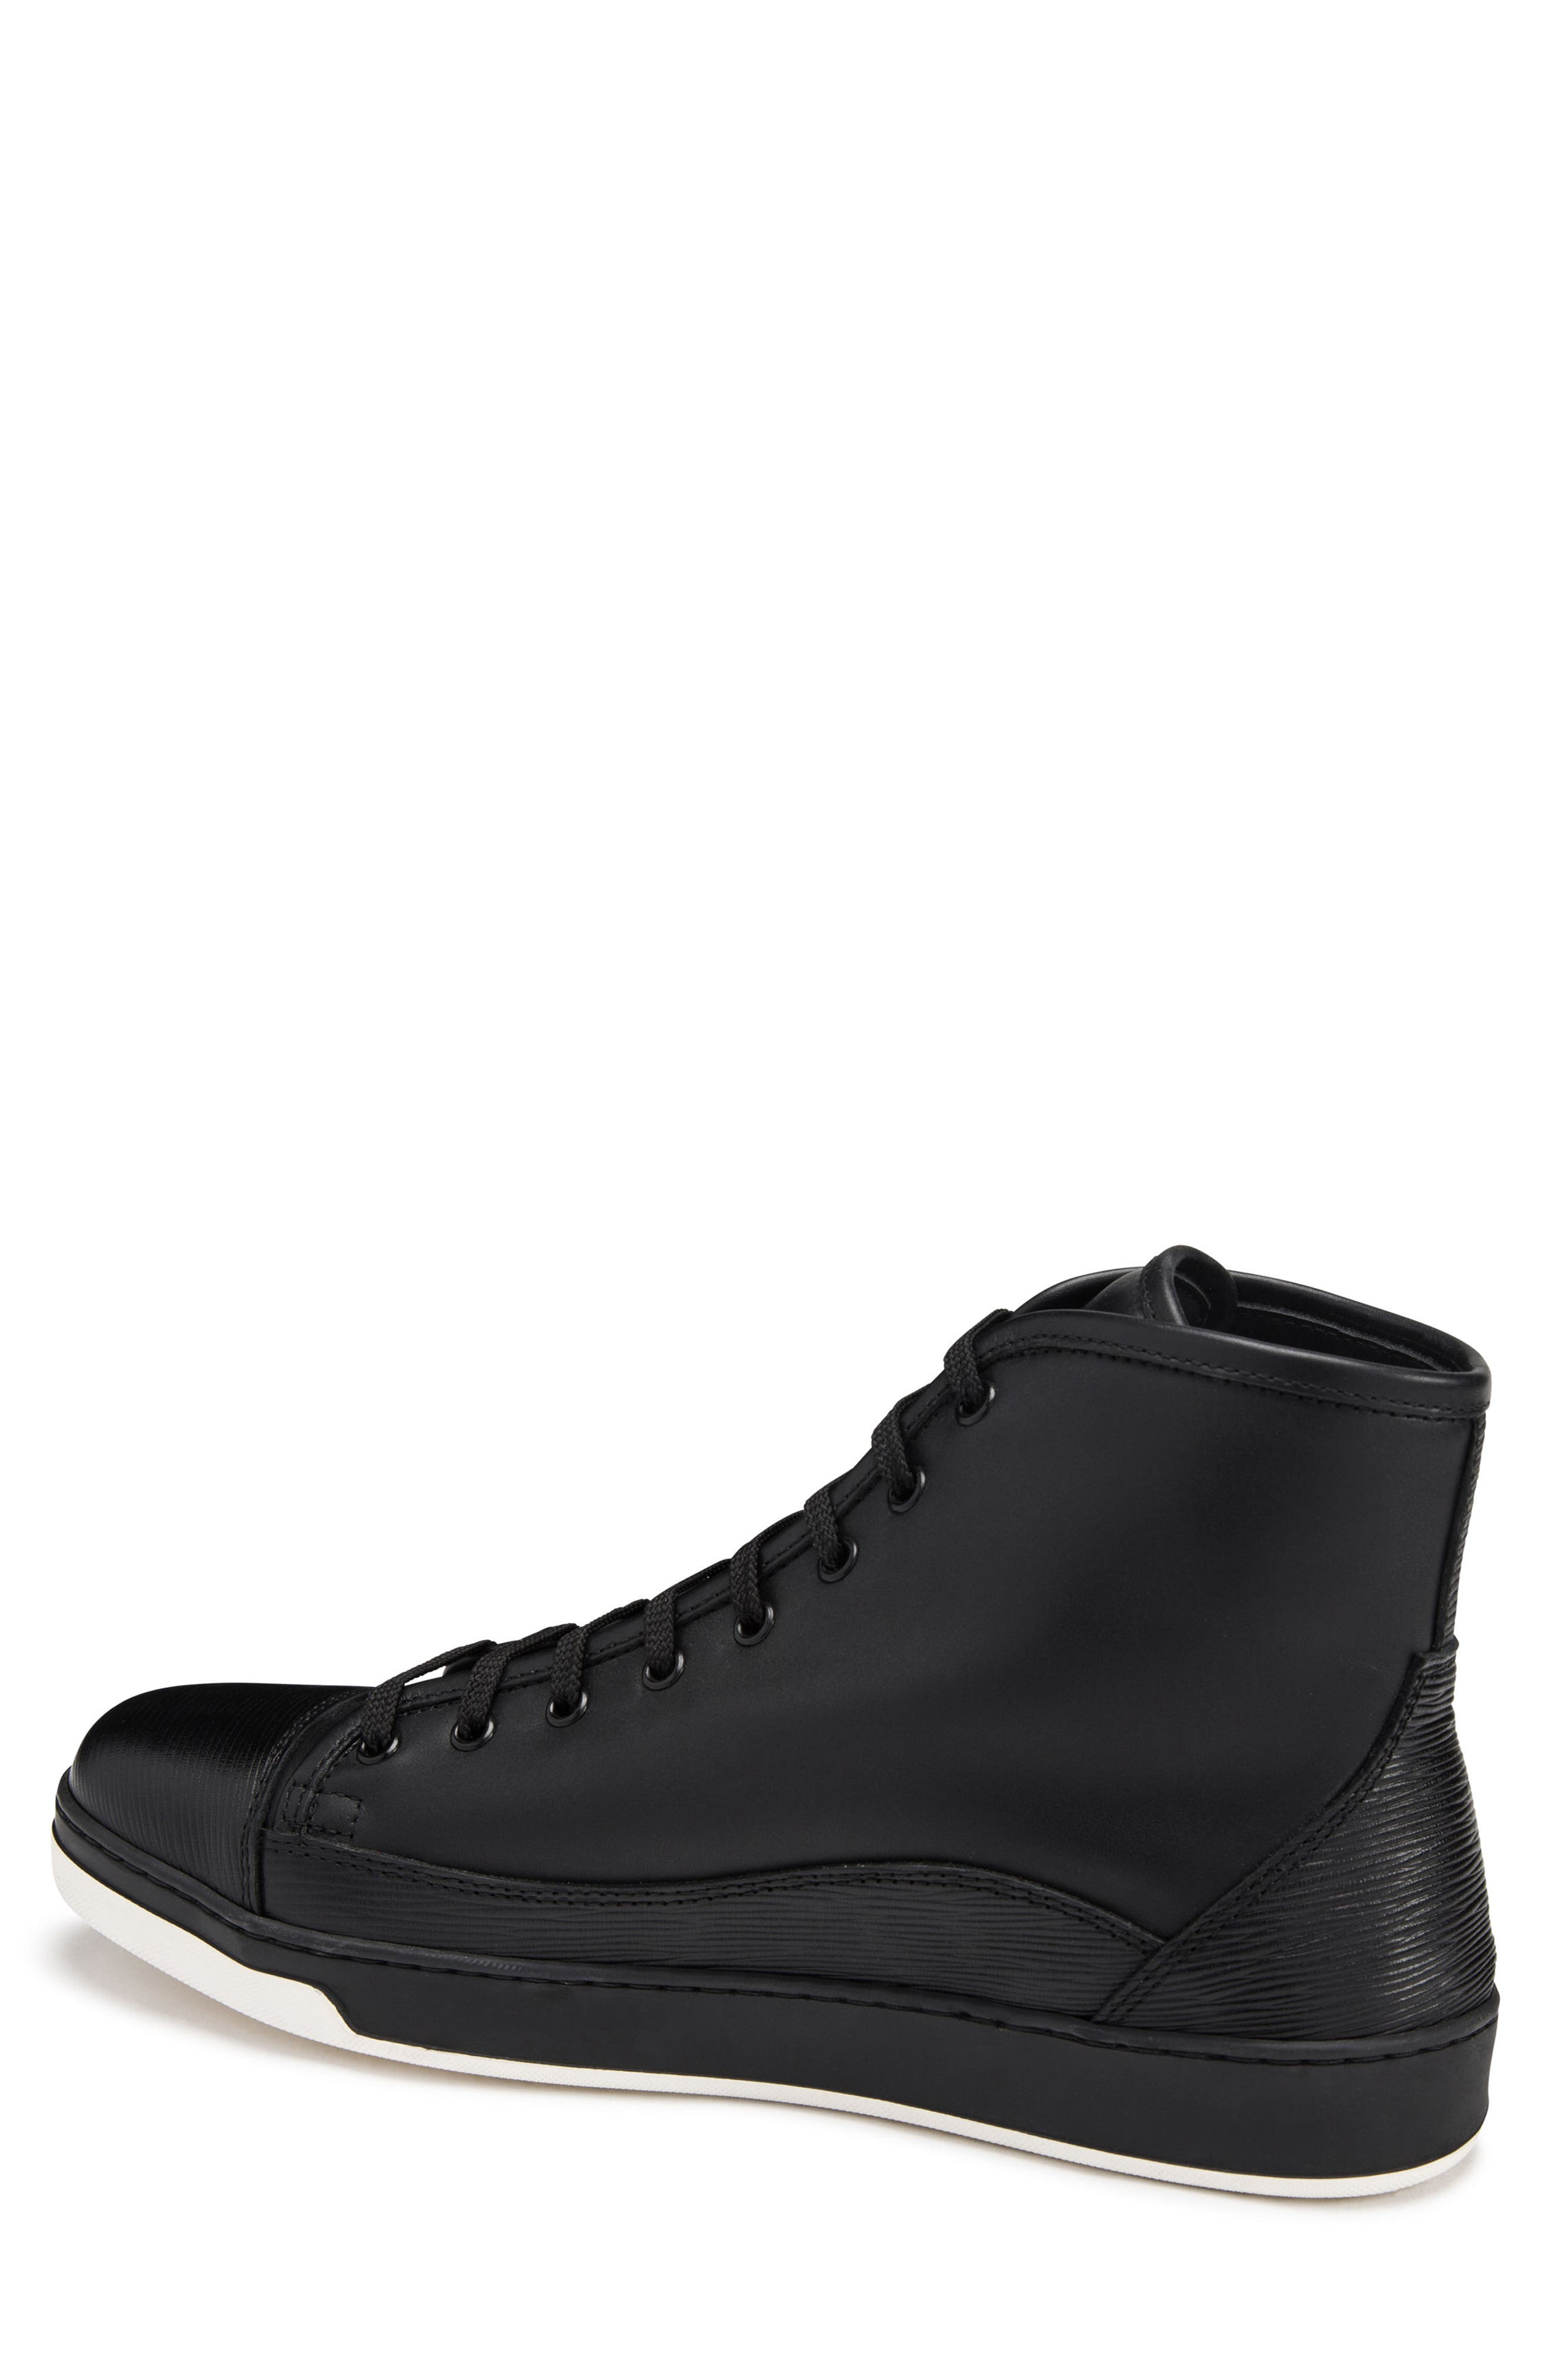 Livorno High Top Sneaker,                             Alternate thumbnail 2, color,                             NERO